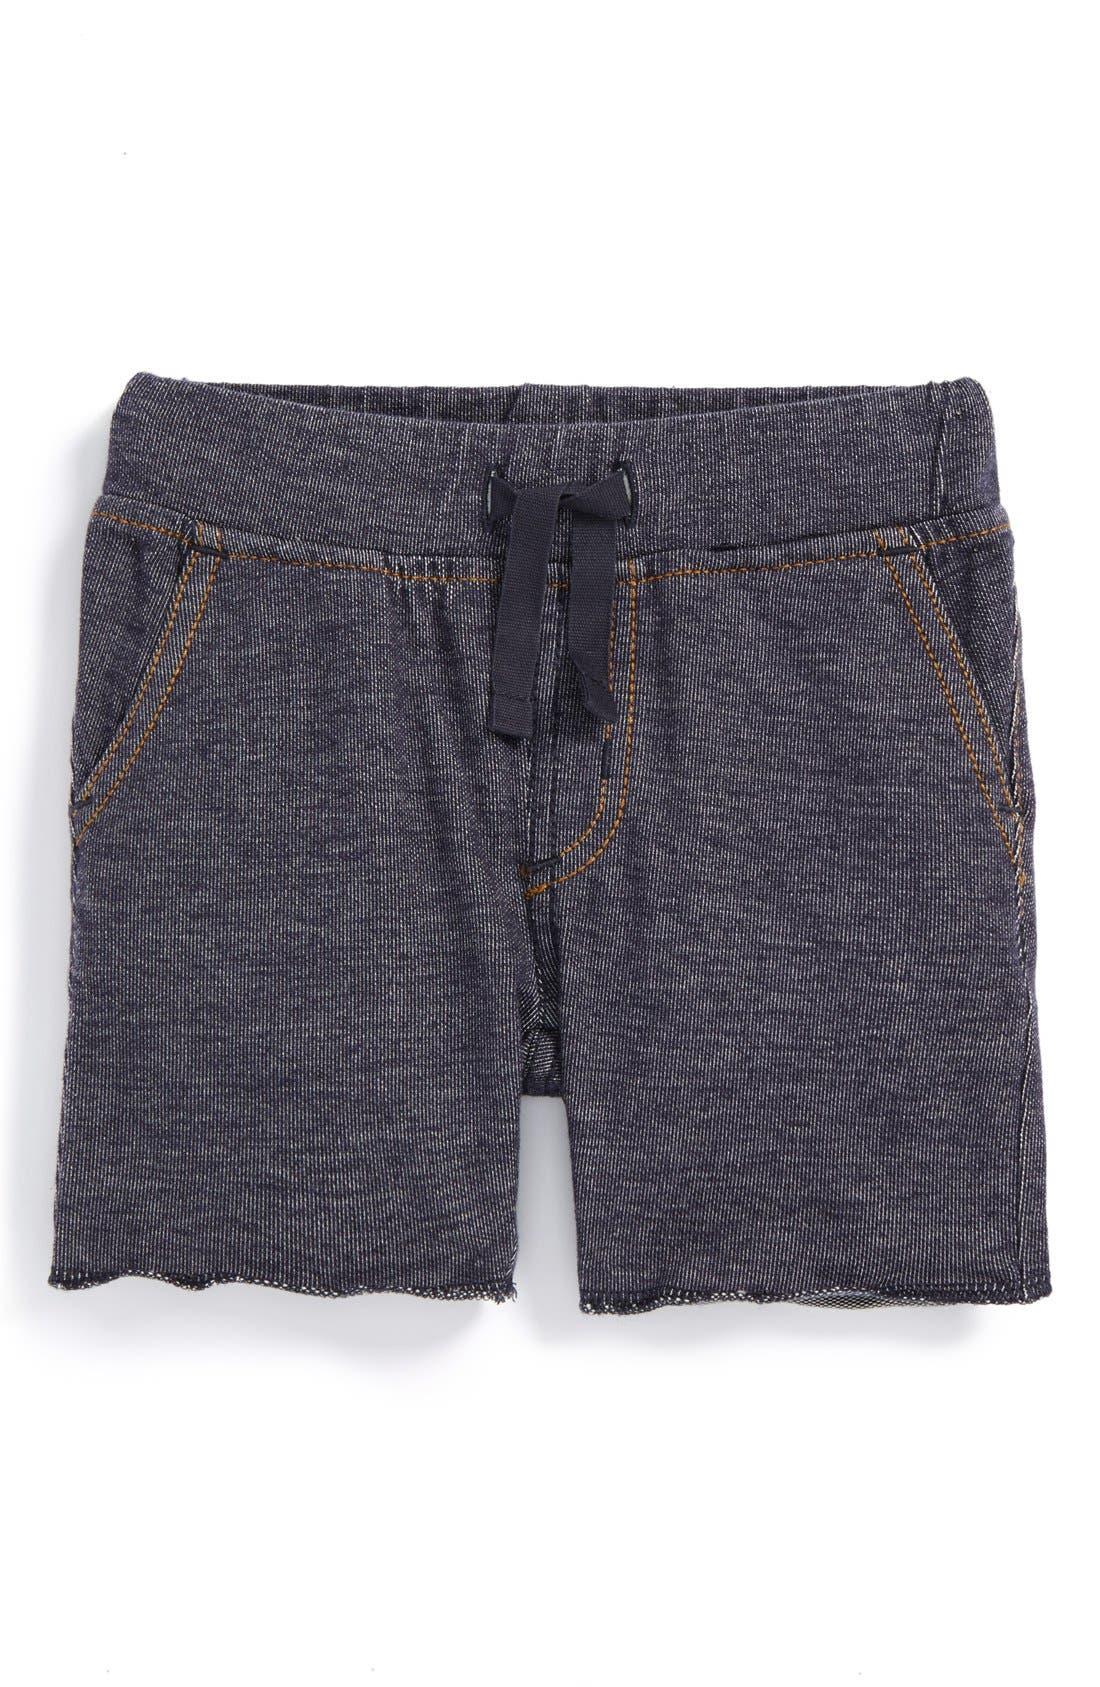 Denim Look Shorts,                             Main thumbnail 1, color,                             411